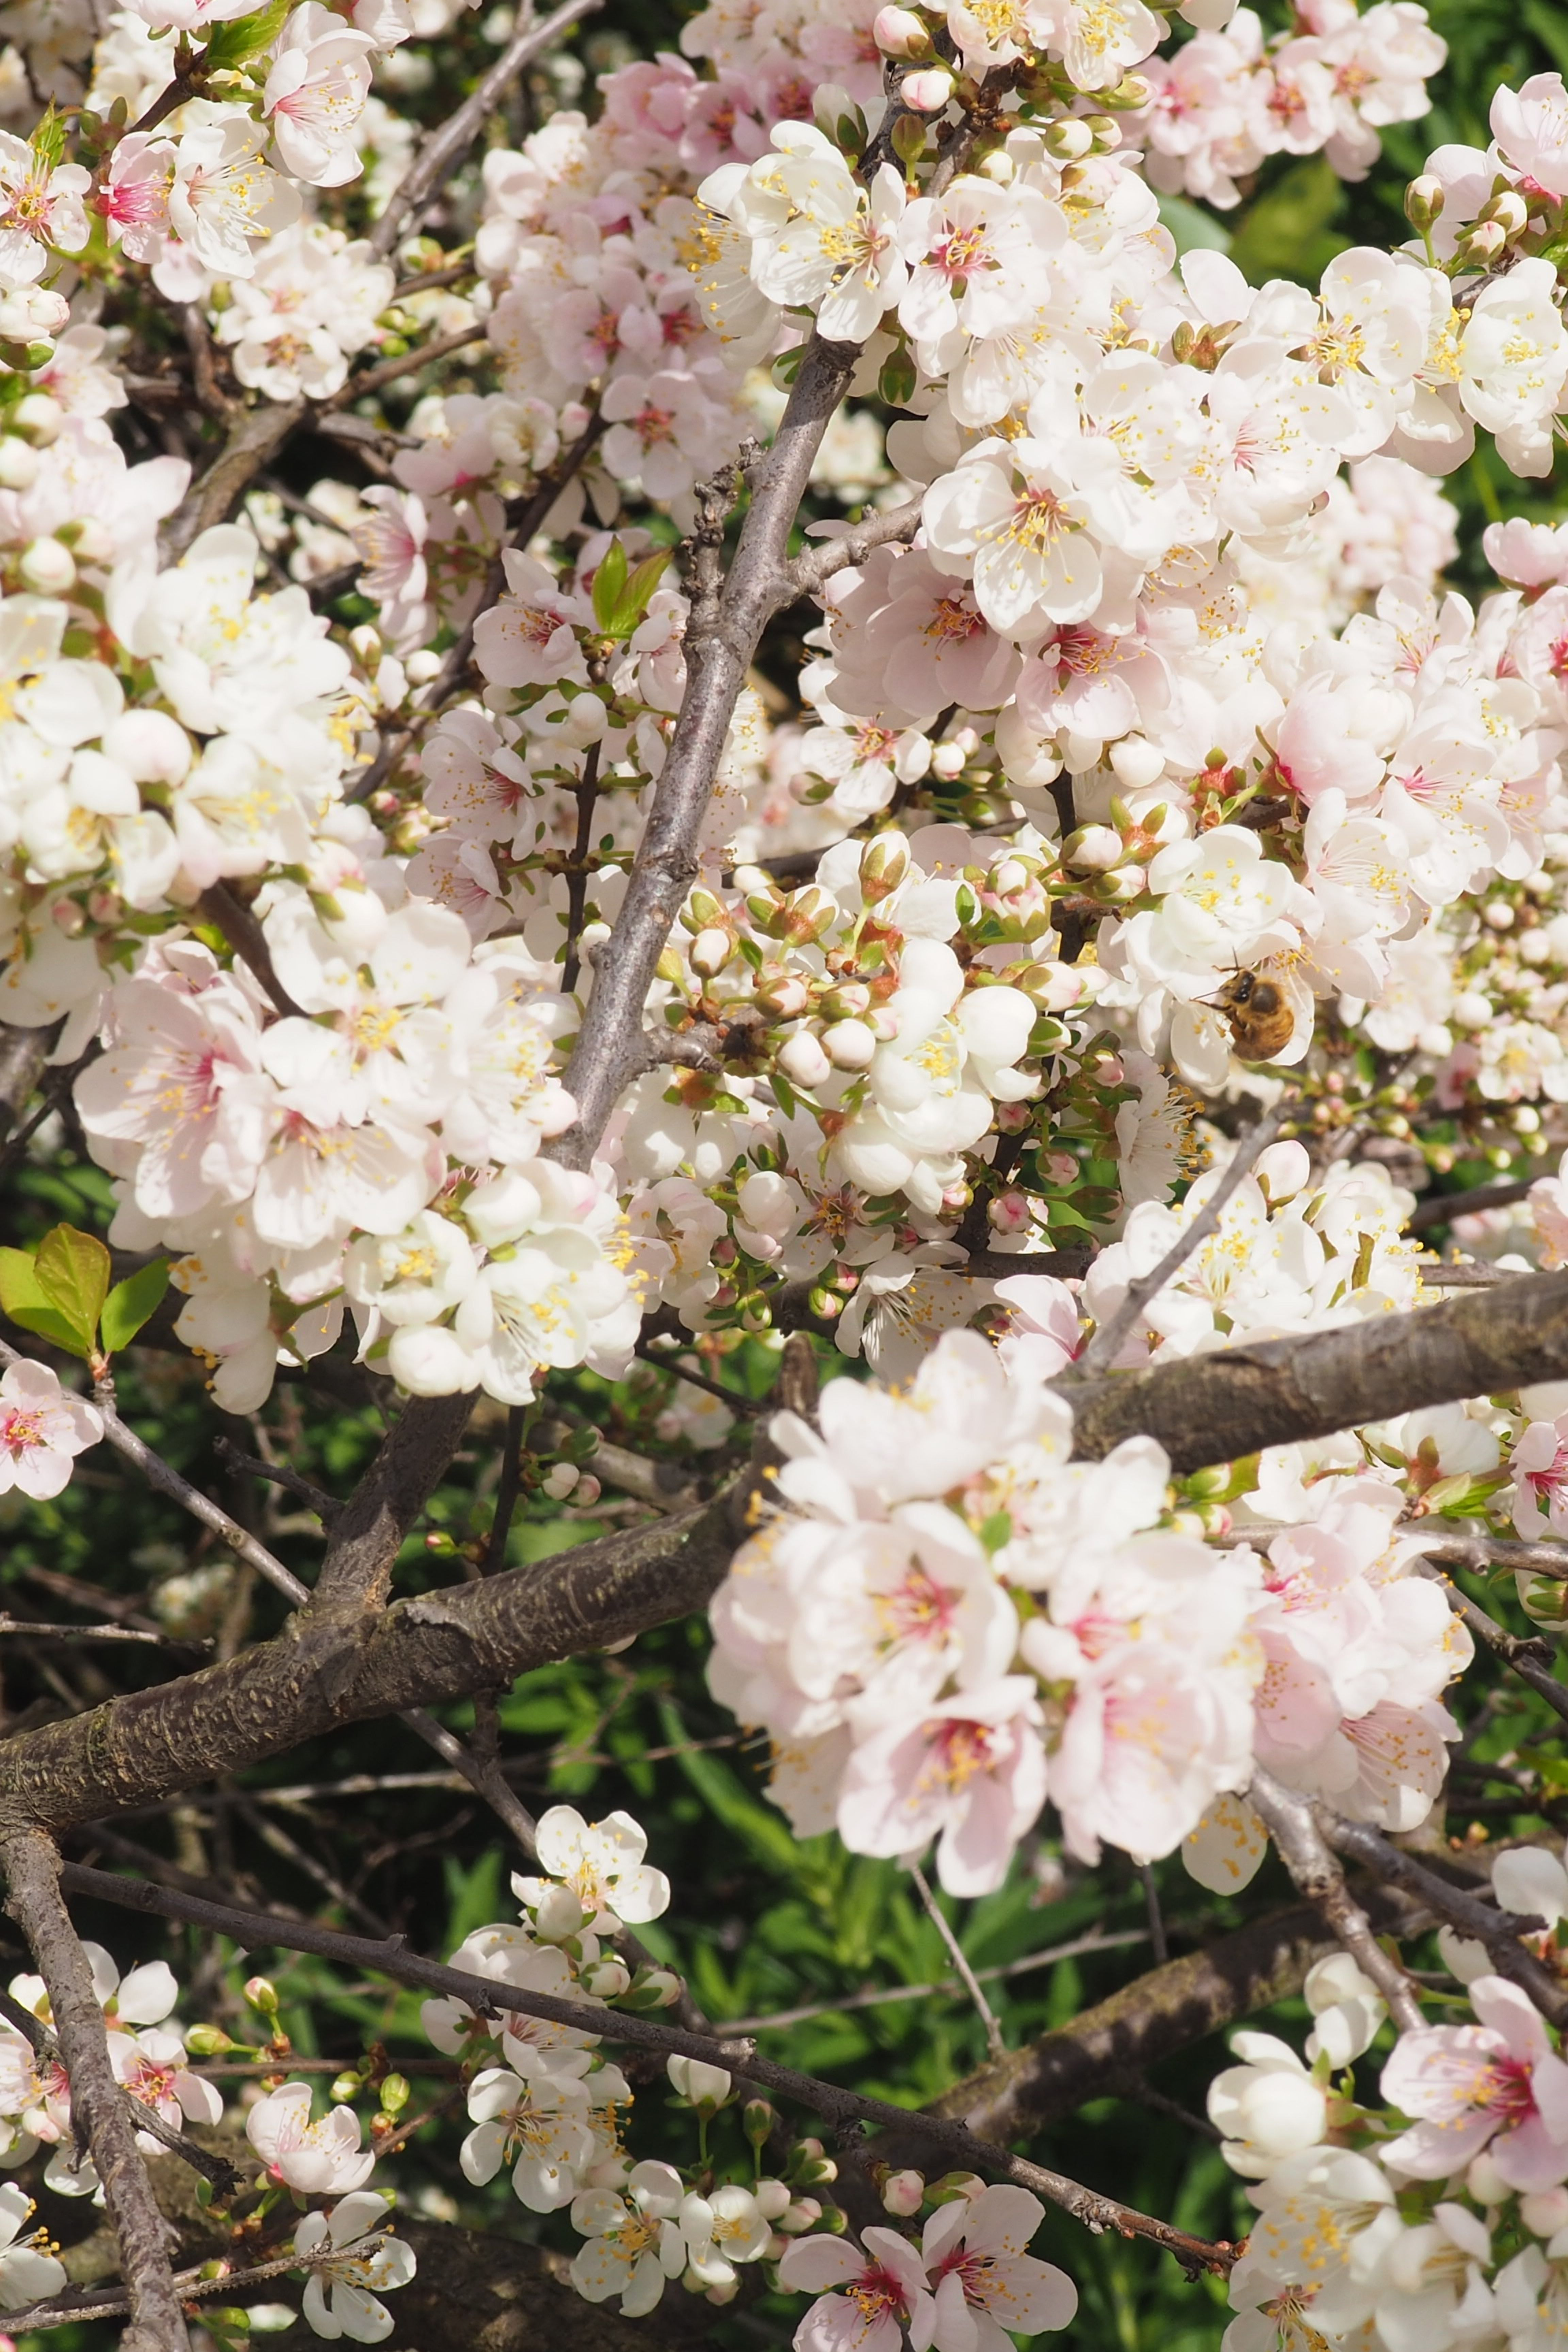 Spring Blossom Flower Tree In Melbourne Australia Blossom Flower Flowering Trees Spring Blossom